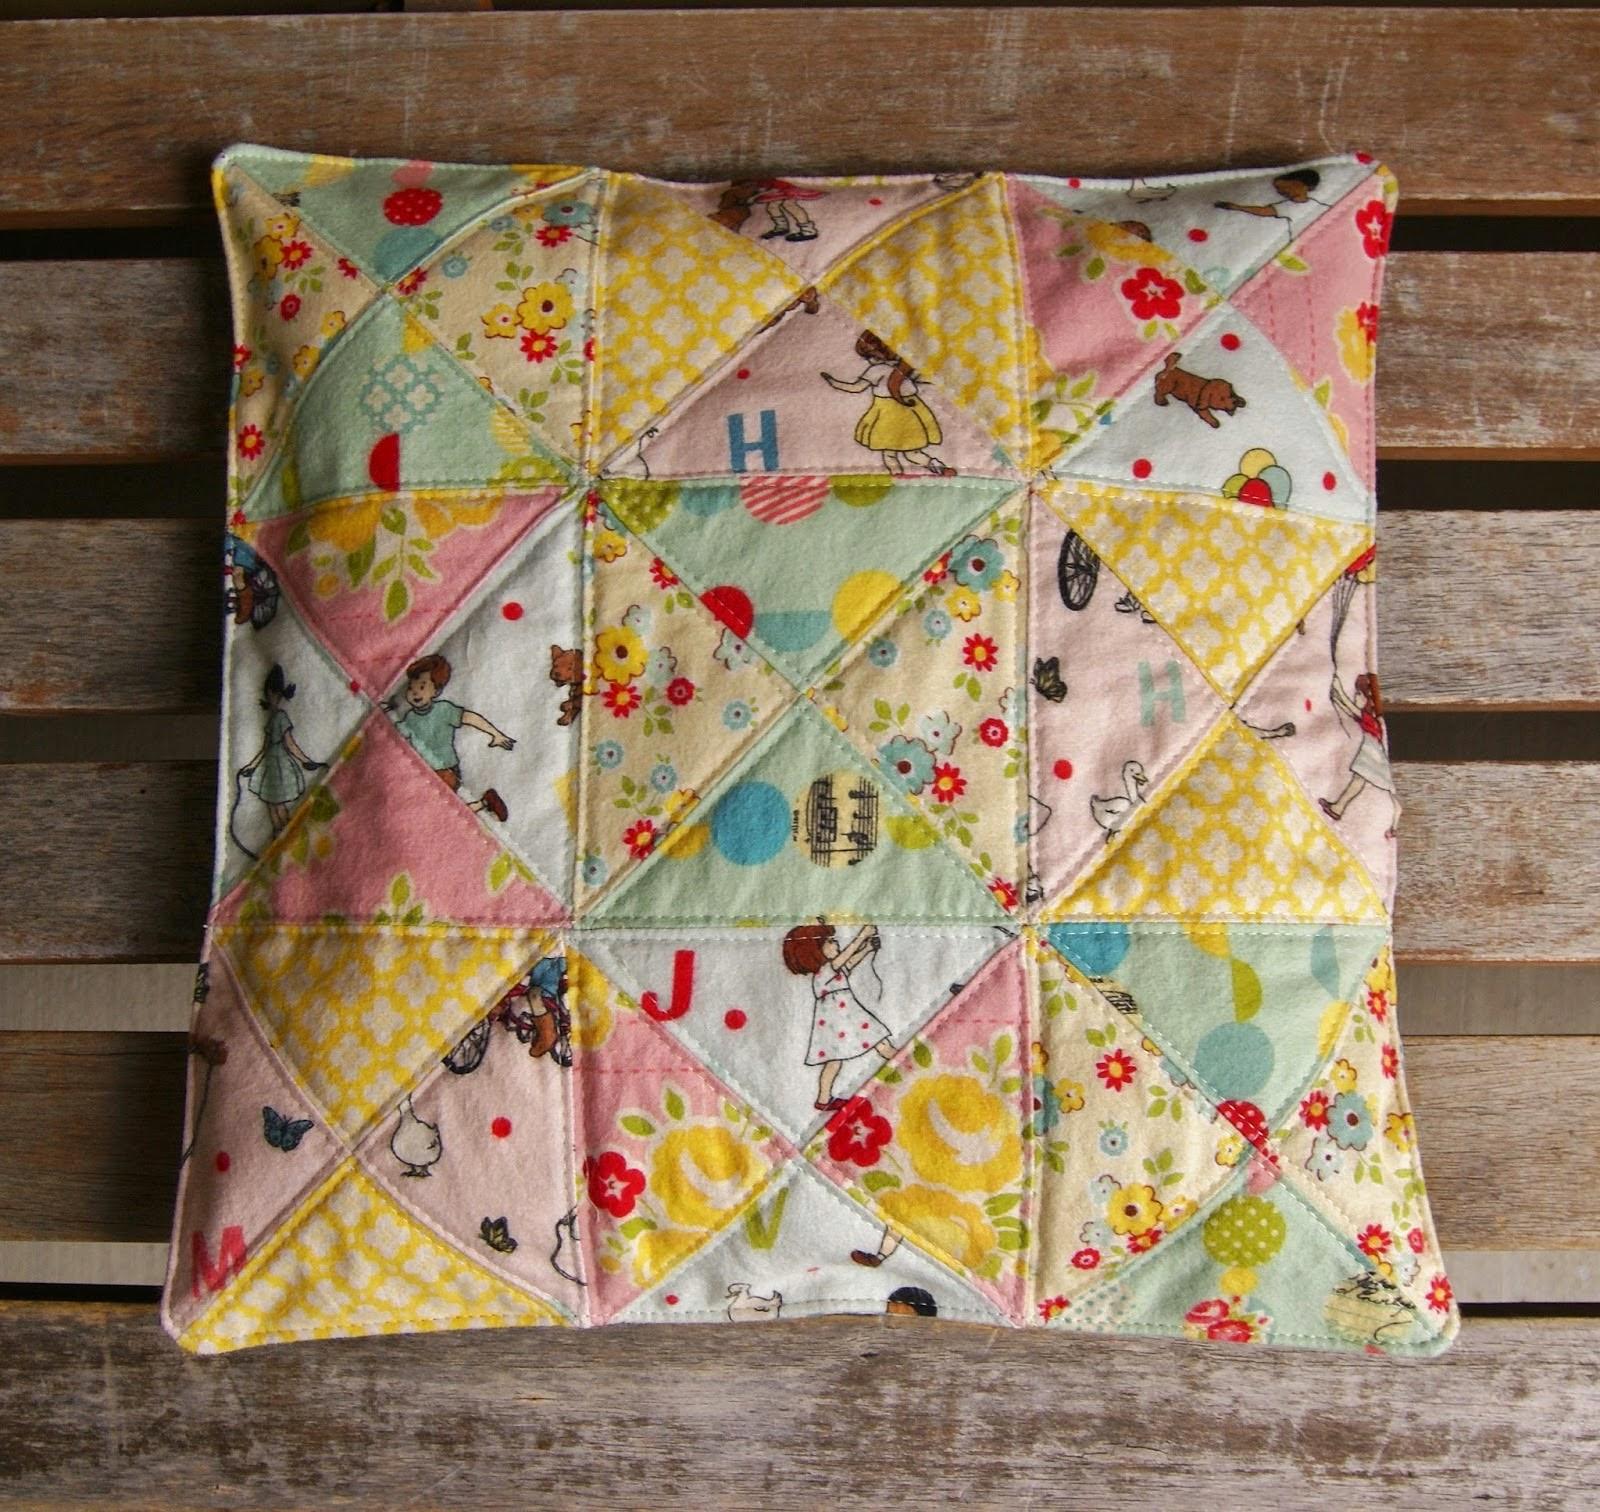 http://fabricmutt.blogspot.com/2014/09/sidewalks-seat-cushion.html